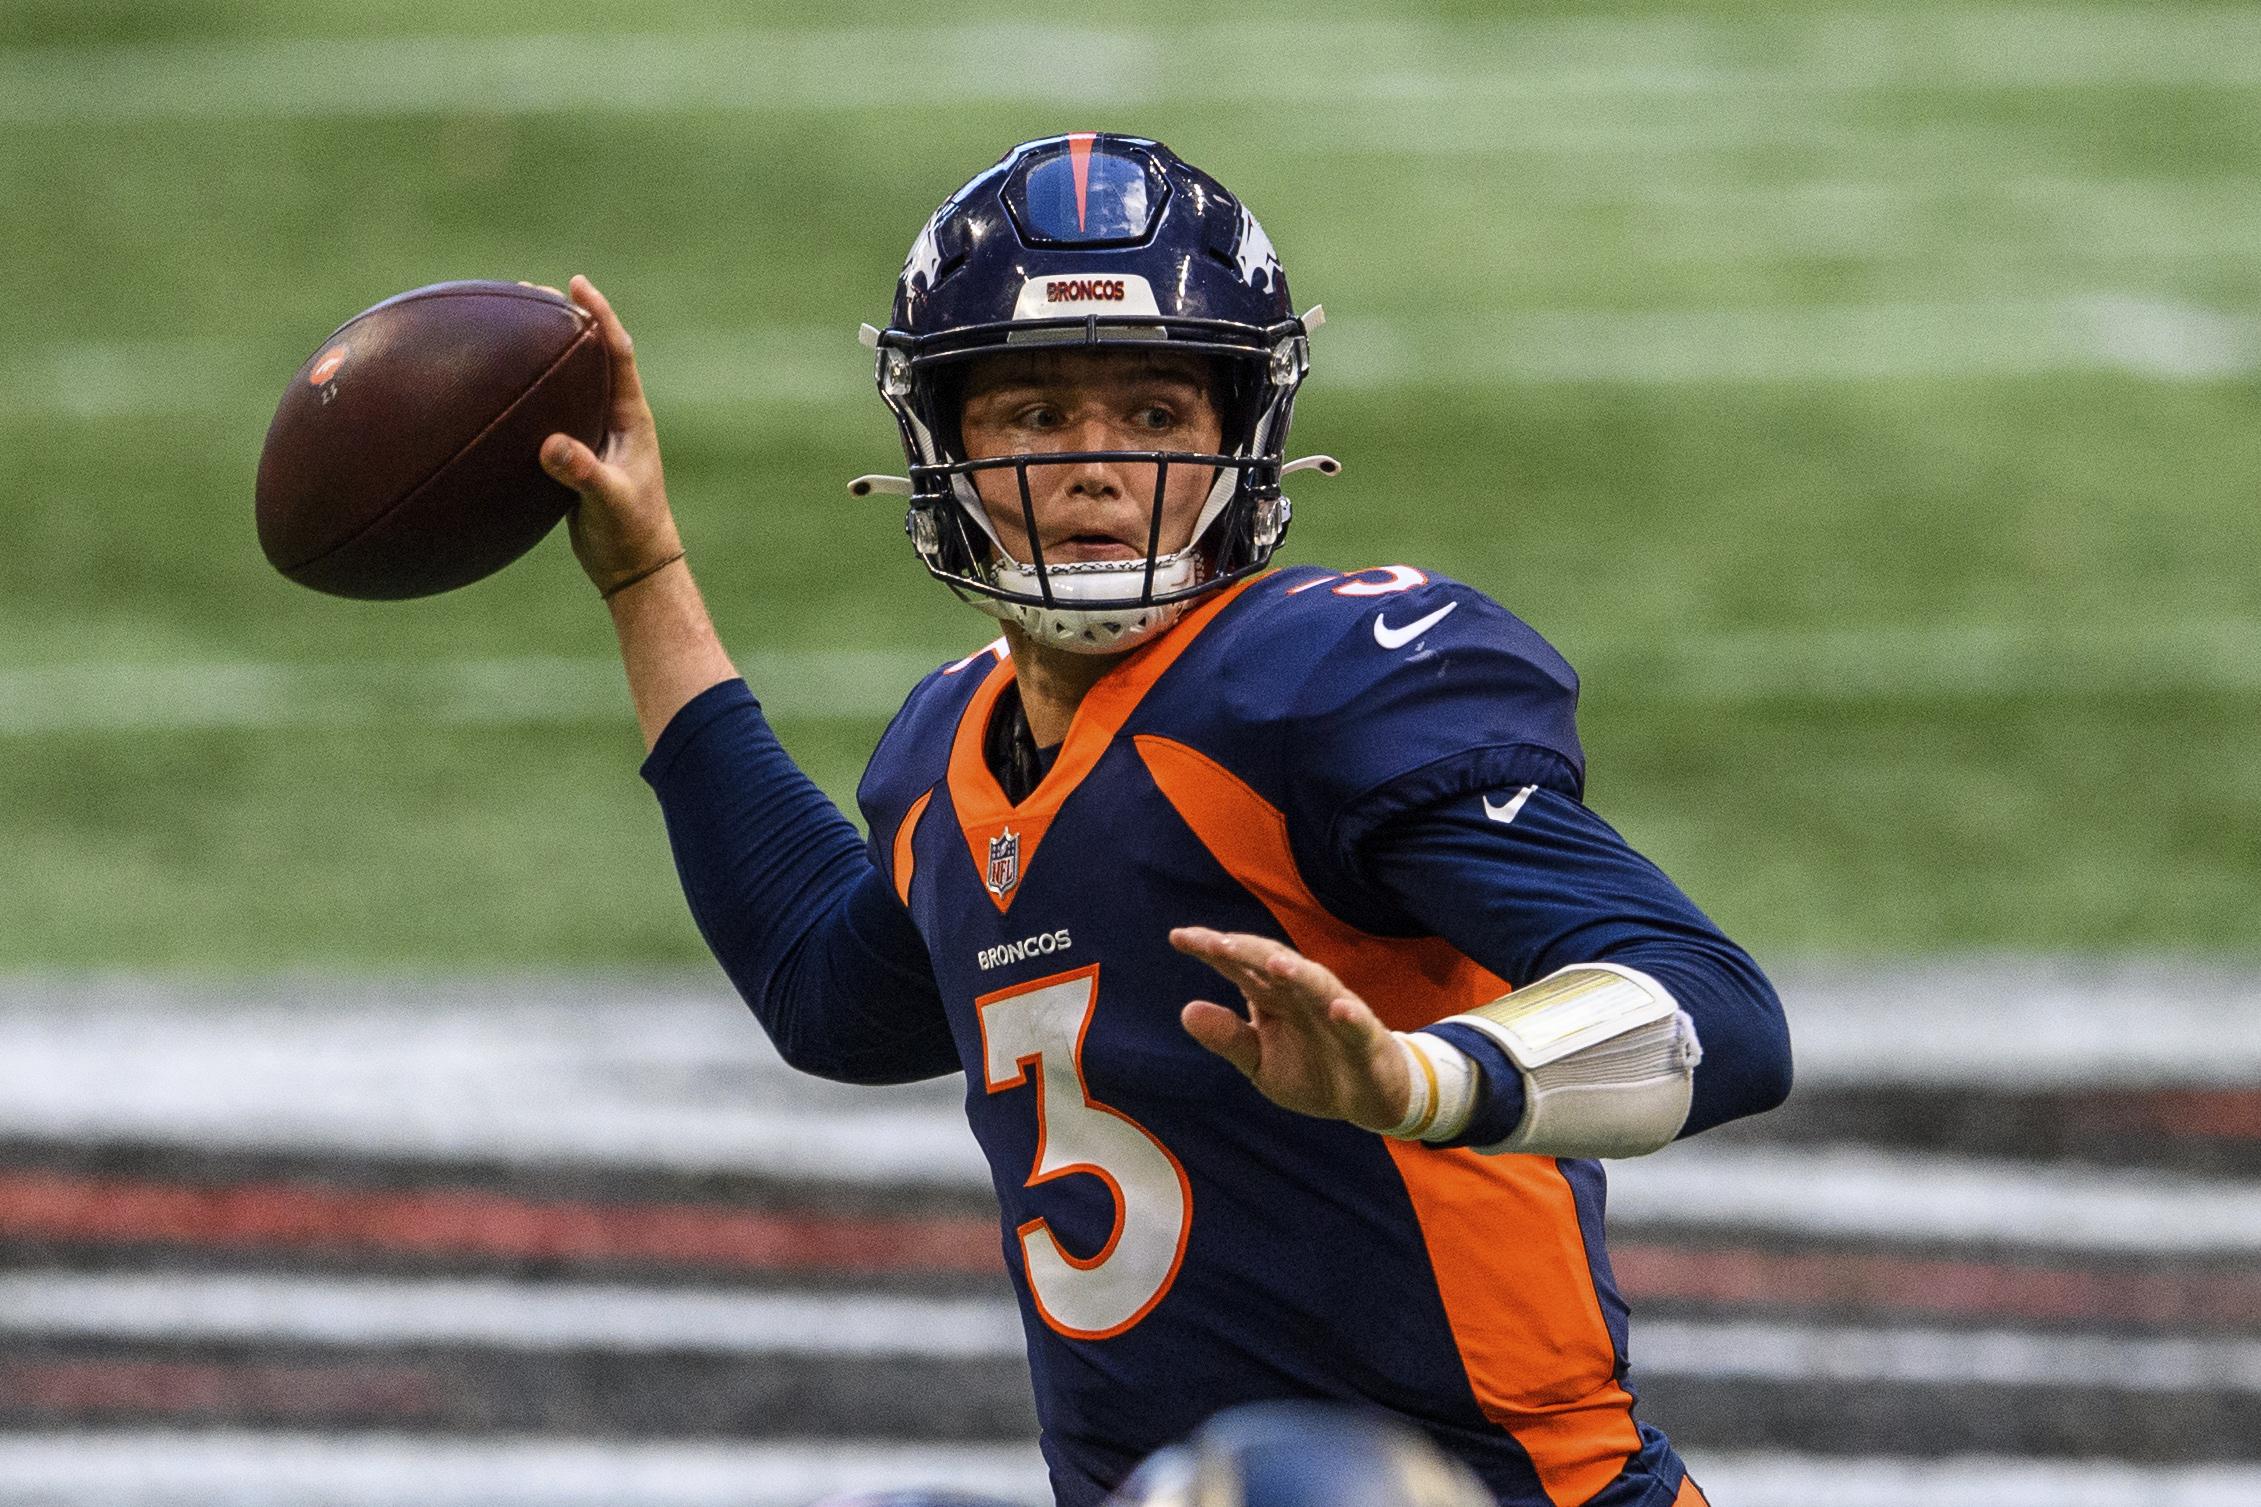 Denver Broncos Warning Do Not Disturb While Im Watching The Broncos Serious Injury Or